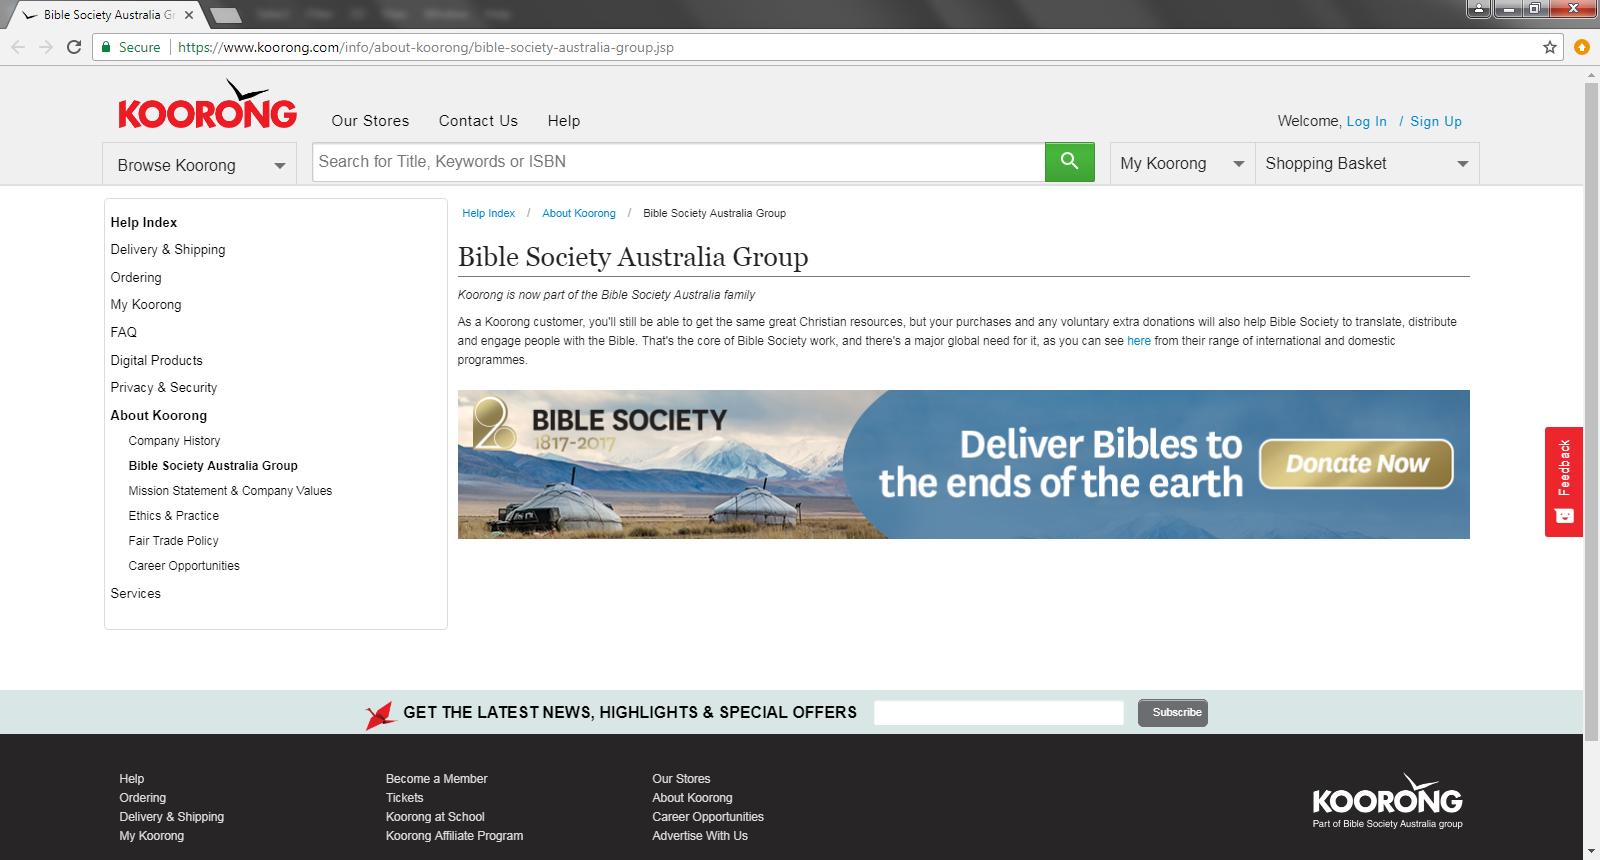 Dangers of Australian Bible Society (Part 2): Producing